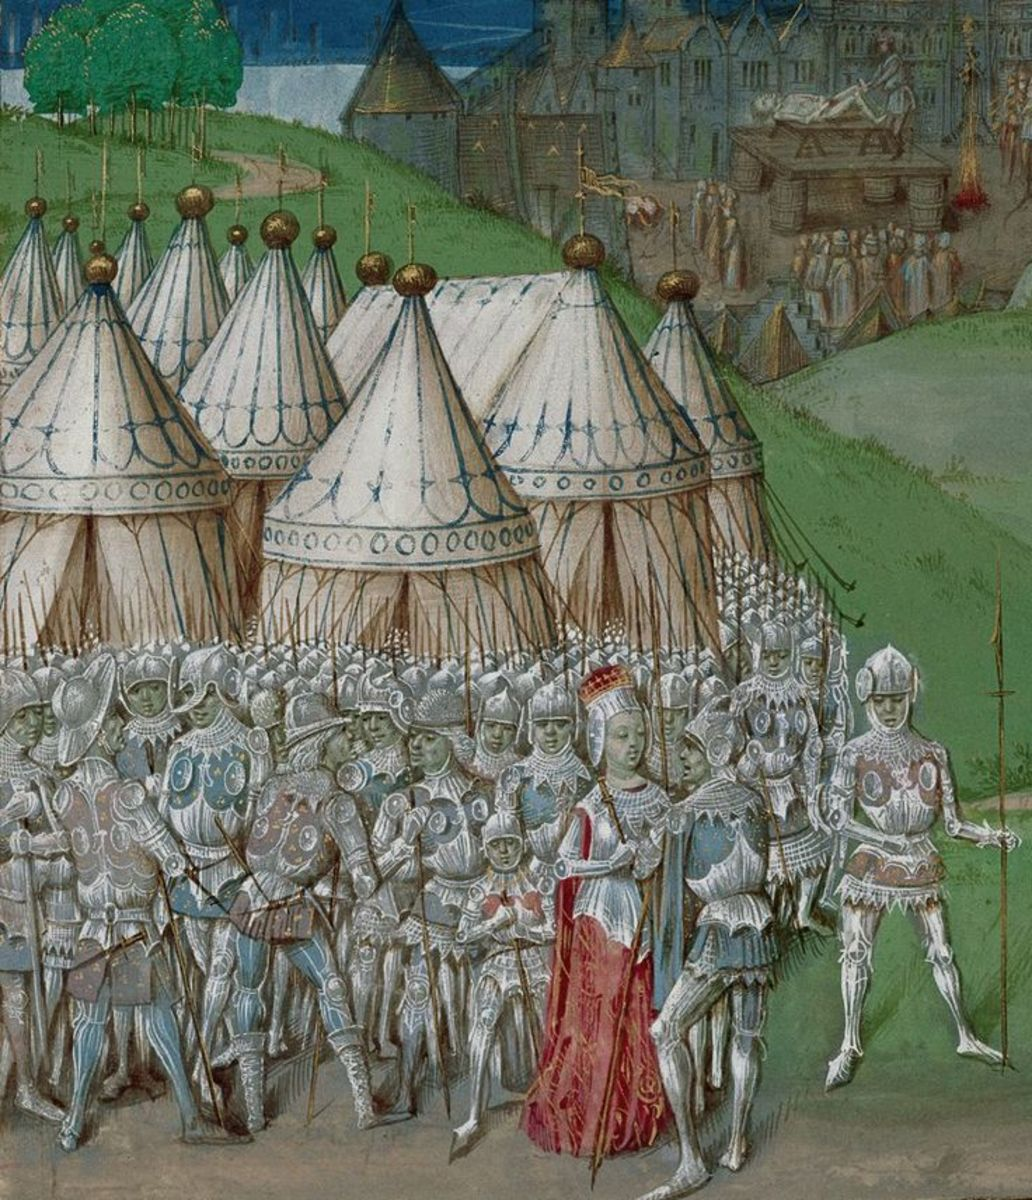 Roger Mortimer, Great Grandfather of Richard III, who usurped Edward II, then had him killed. Edward III had him hung at Tyburn.